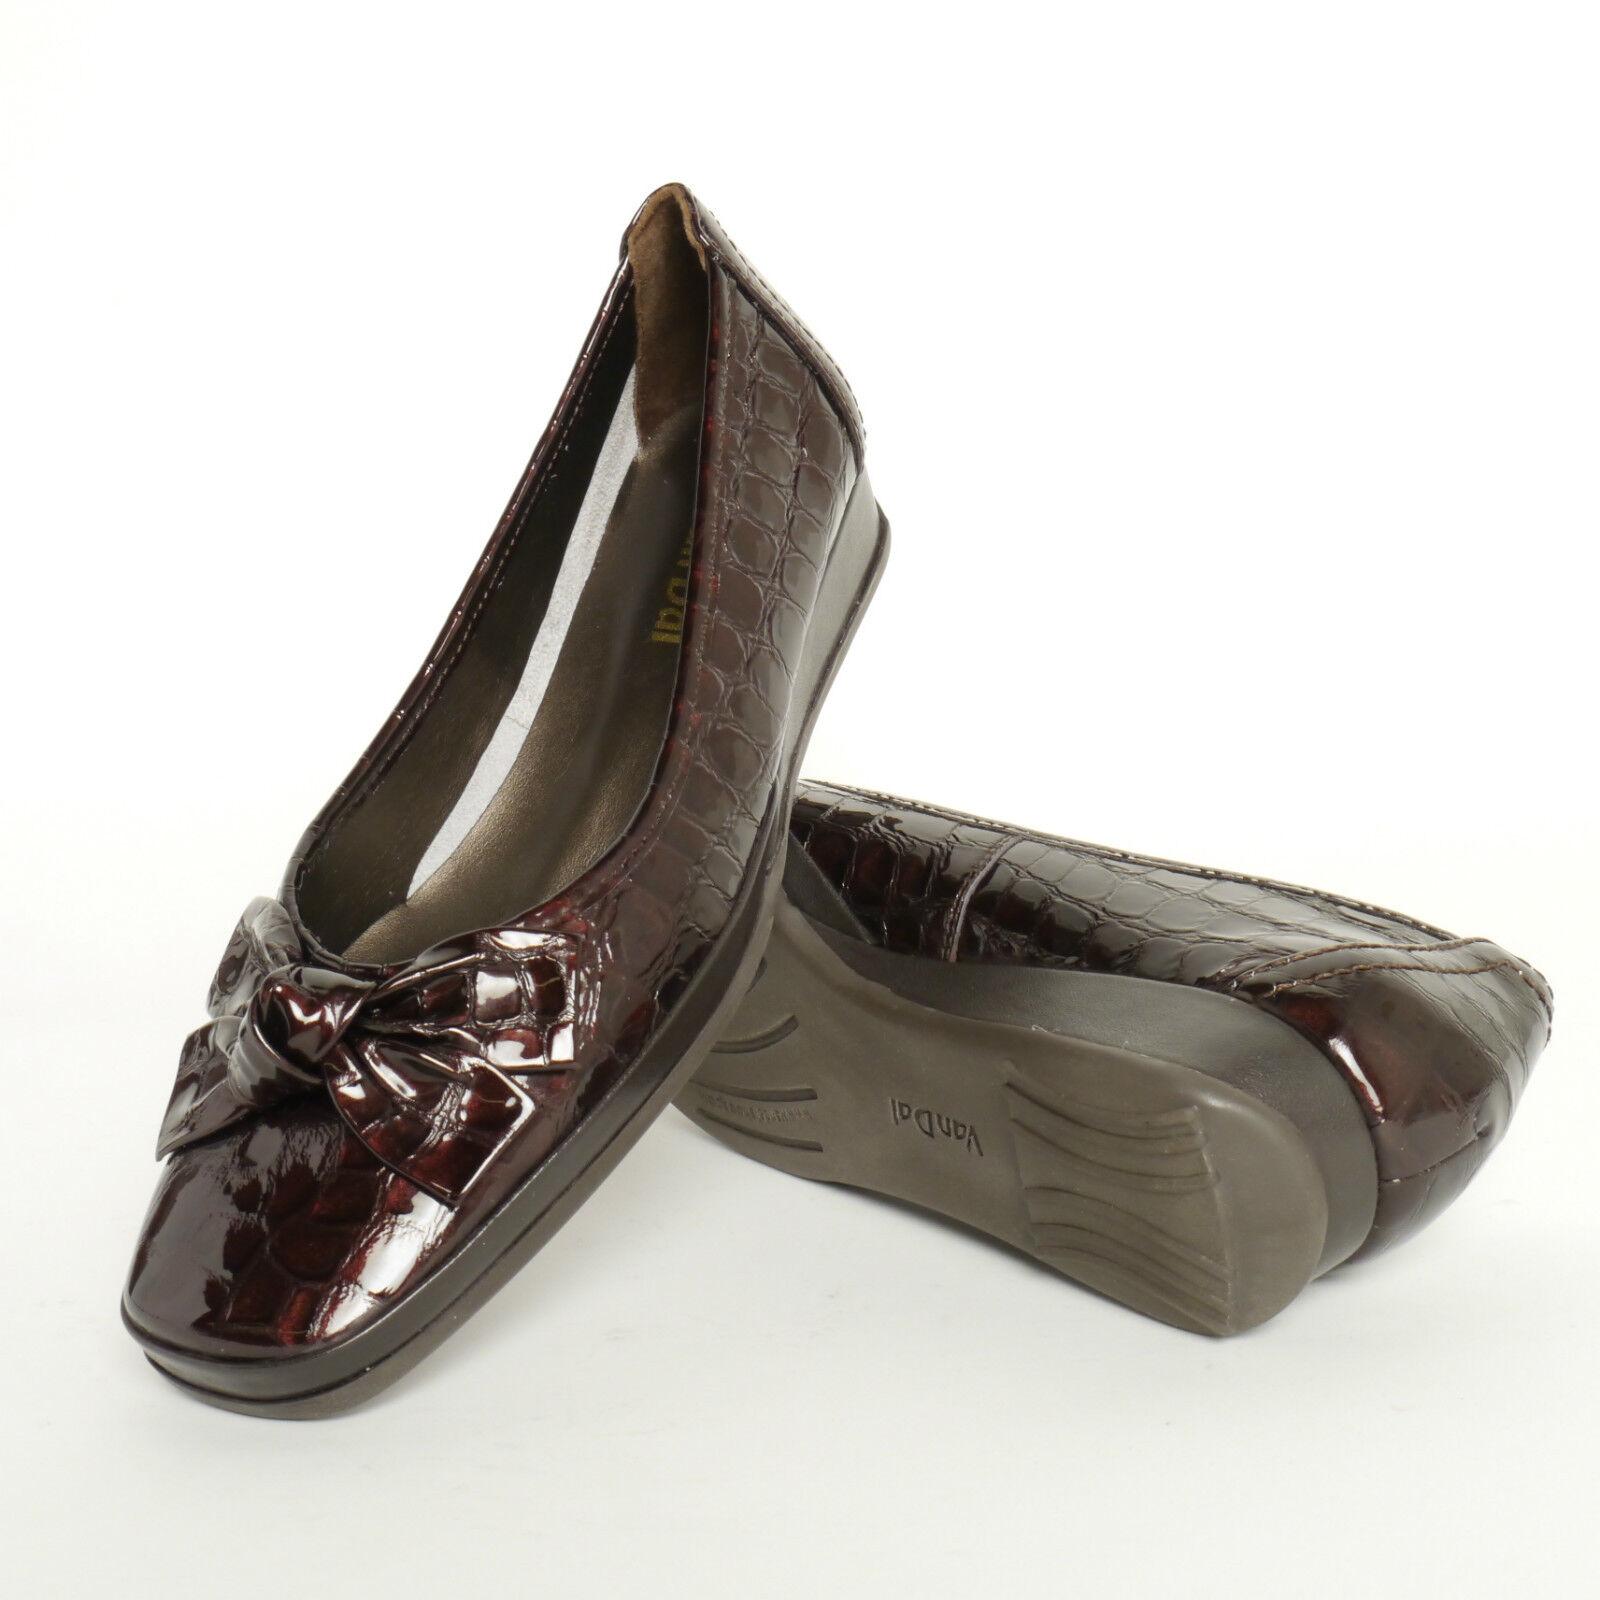 Ladies Van Dal Slip On Shoes In Brown Patent Croc Leather 'Barbados ll' D Width